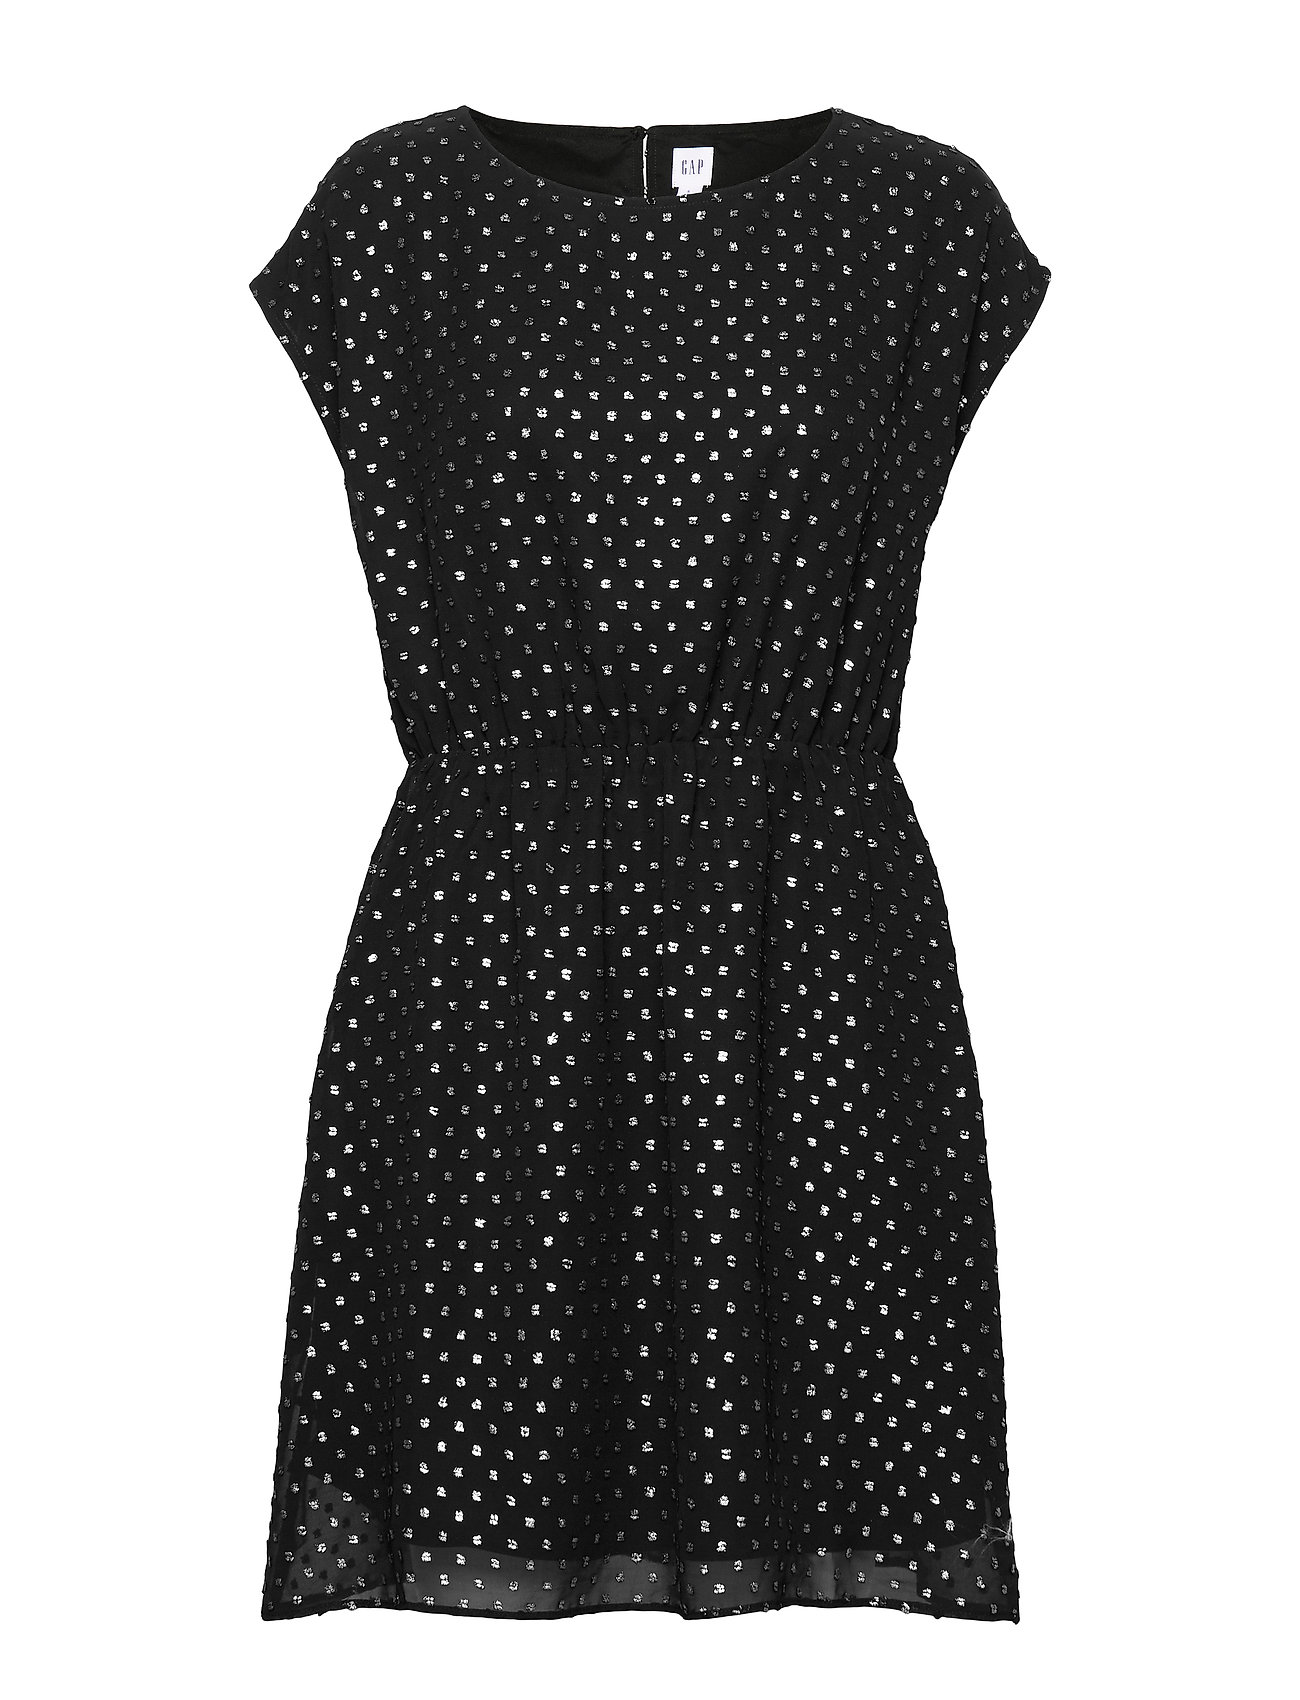 GAP Metallic Clip-Dot Skater Dress - TRUE BLACK V2